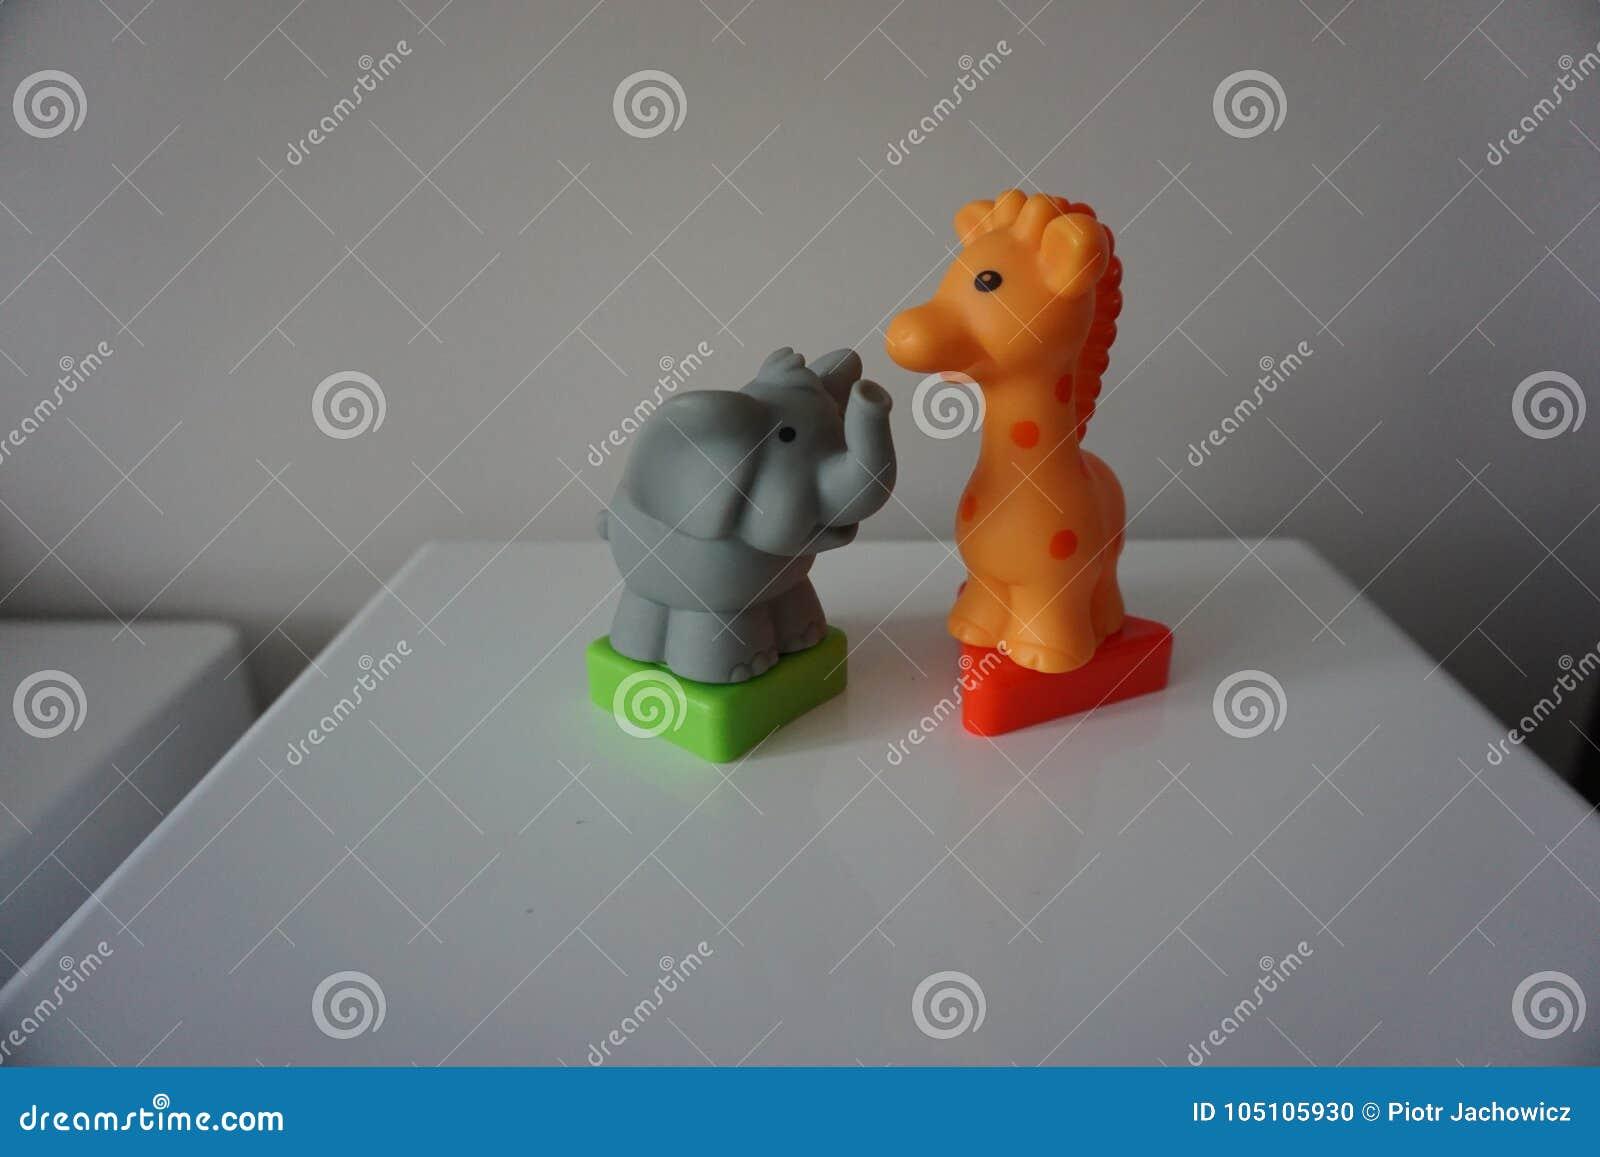 Elefante cinzento e girafa alaranjado Figuras plásticas